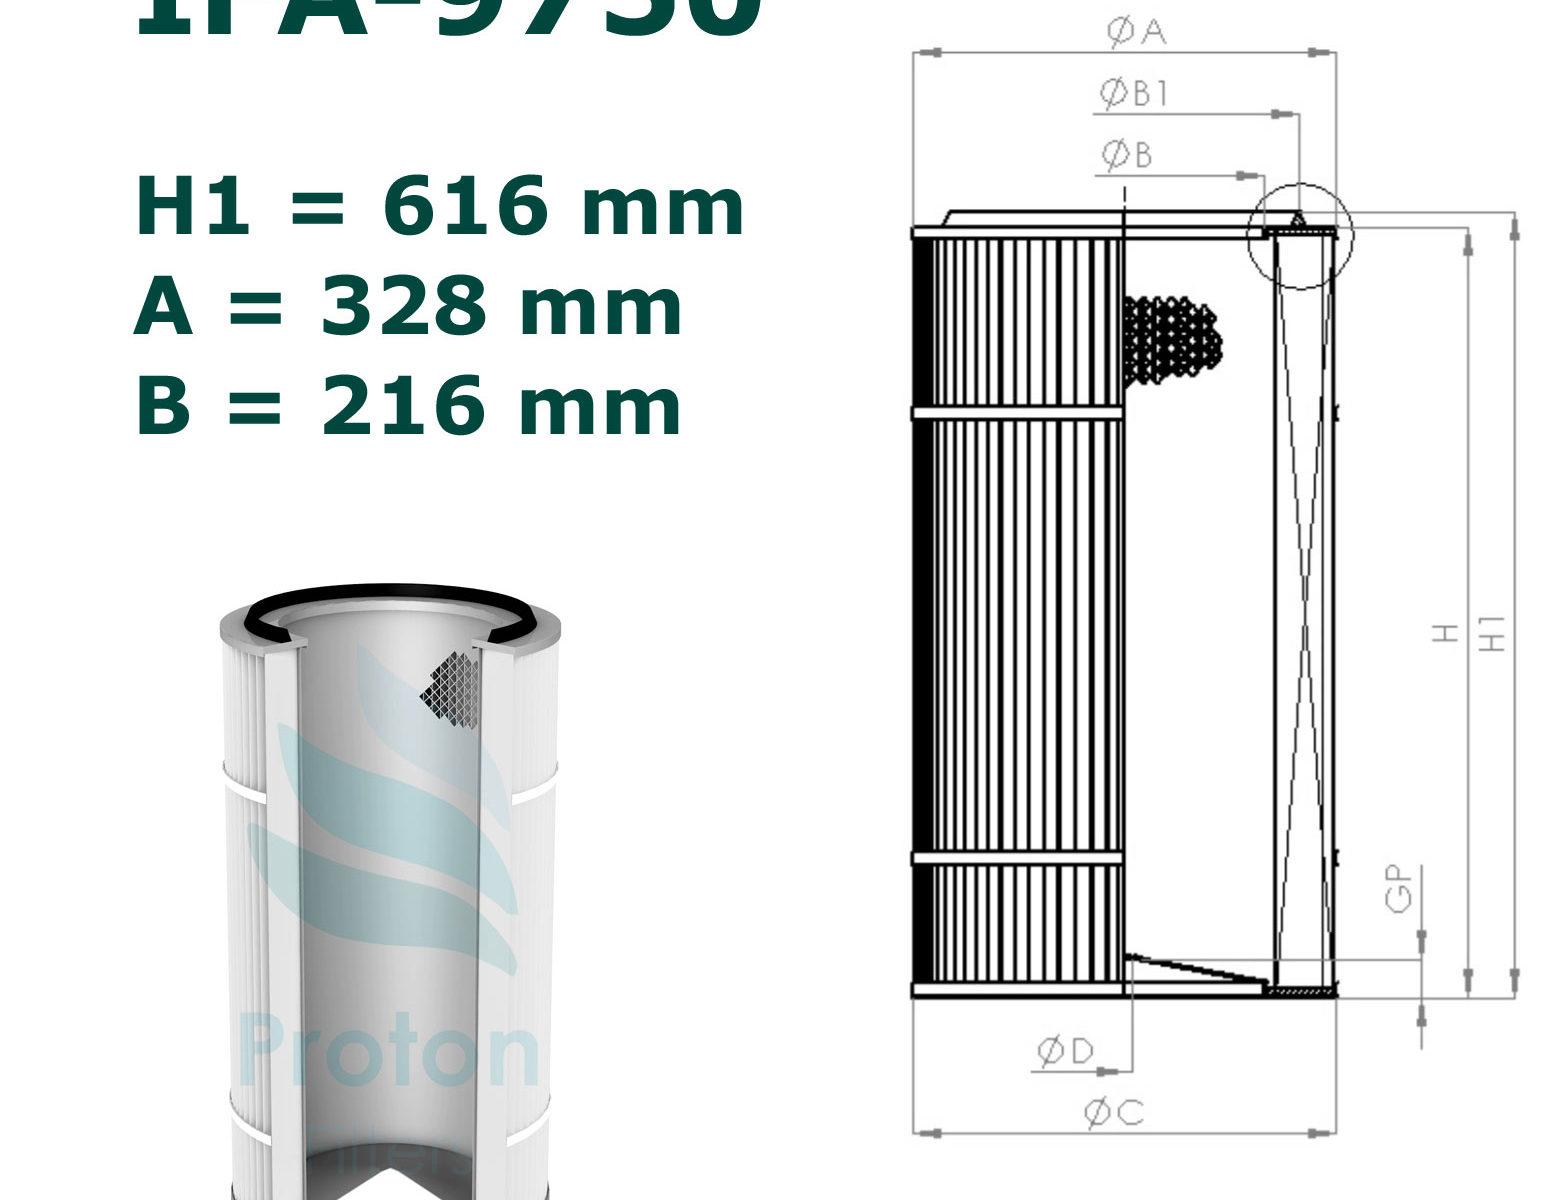 IFA-9750-1565x1200